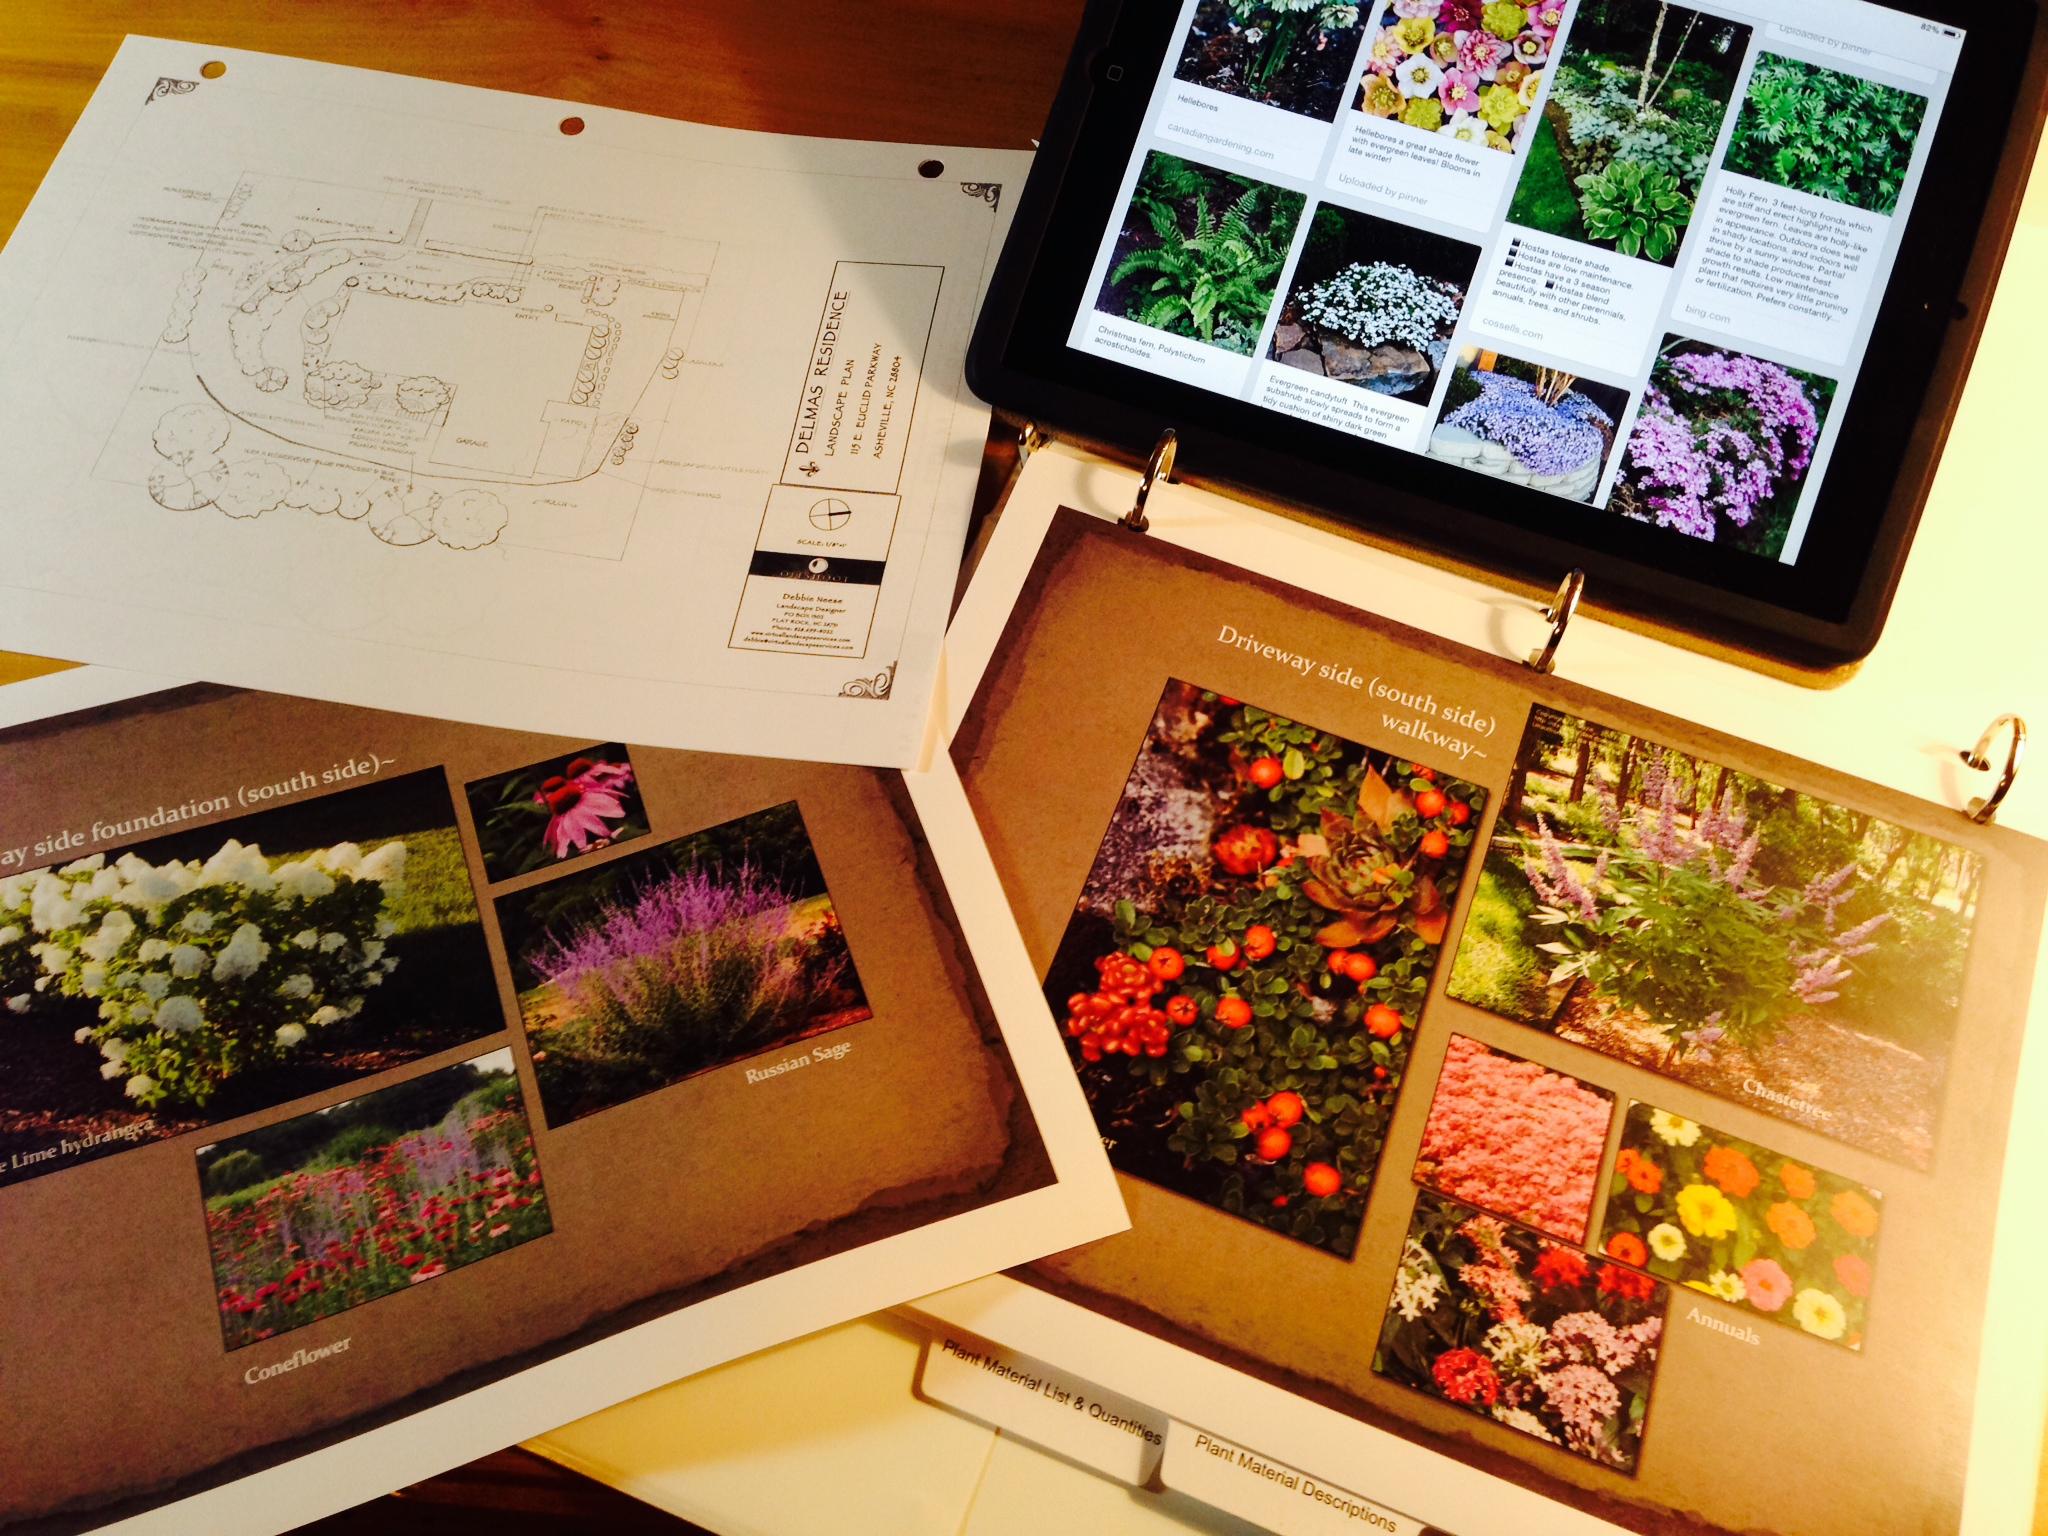 Visuals for the Landscape Design Presentation